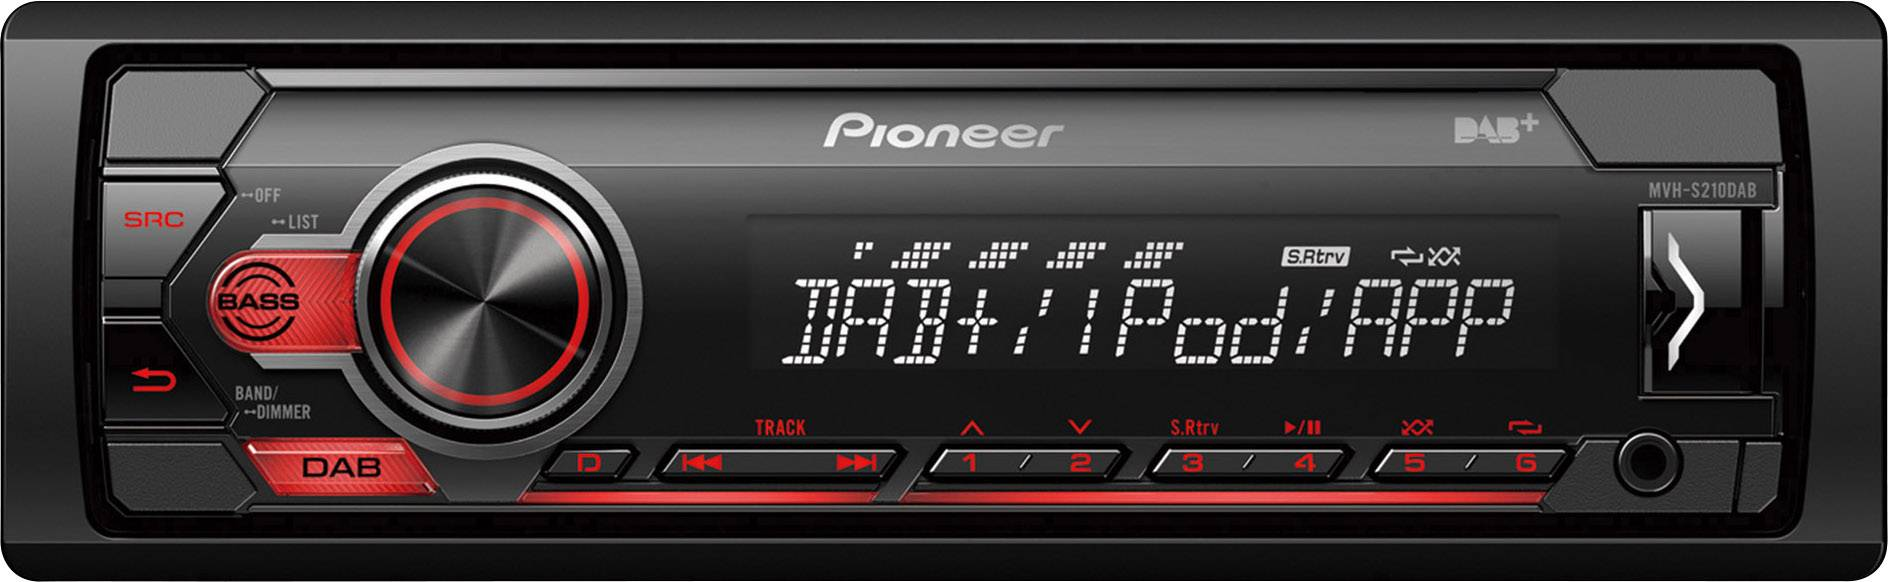 Pioneer mvh-s210dab 1din autorradio